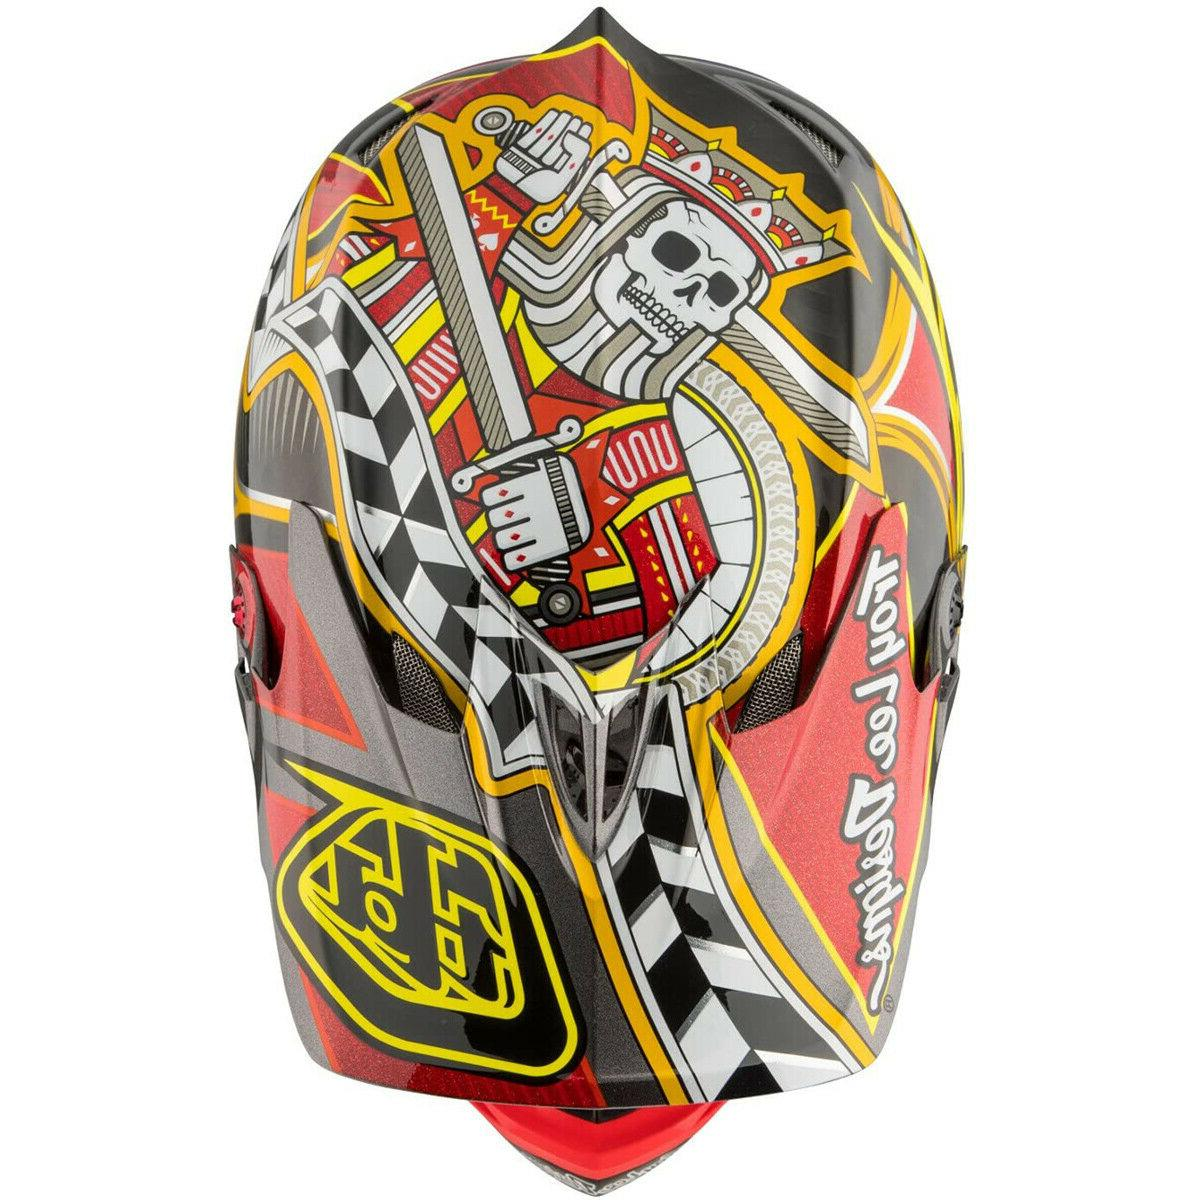 NEW Lee TLD D3 Carbon MTB Helmet Red